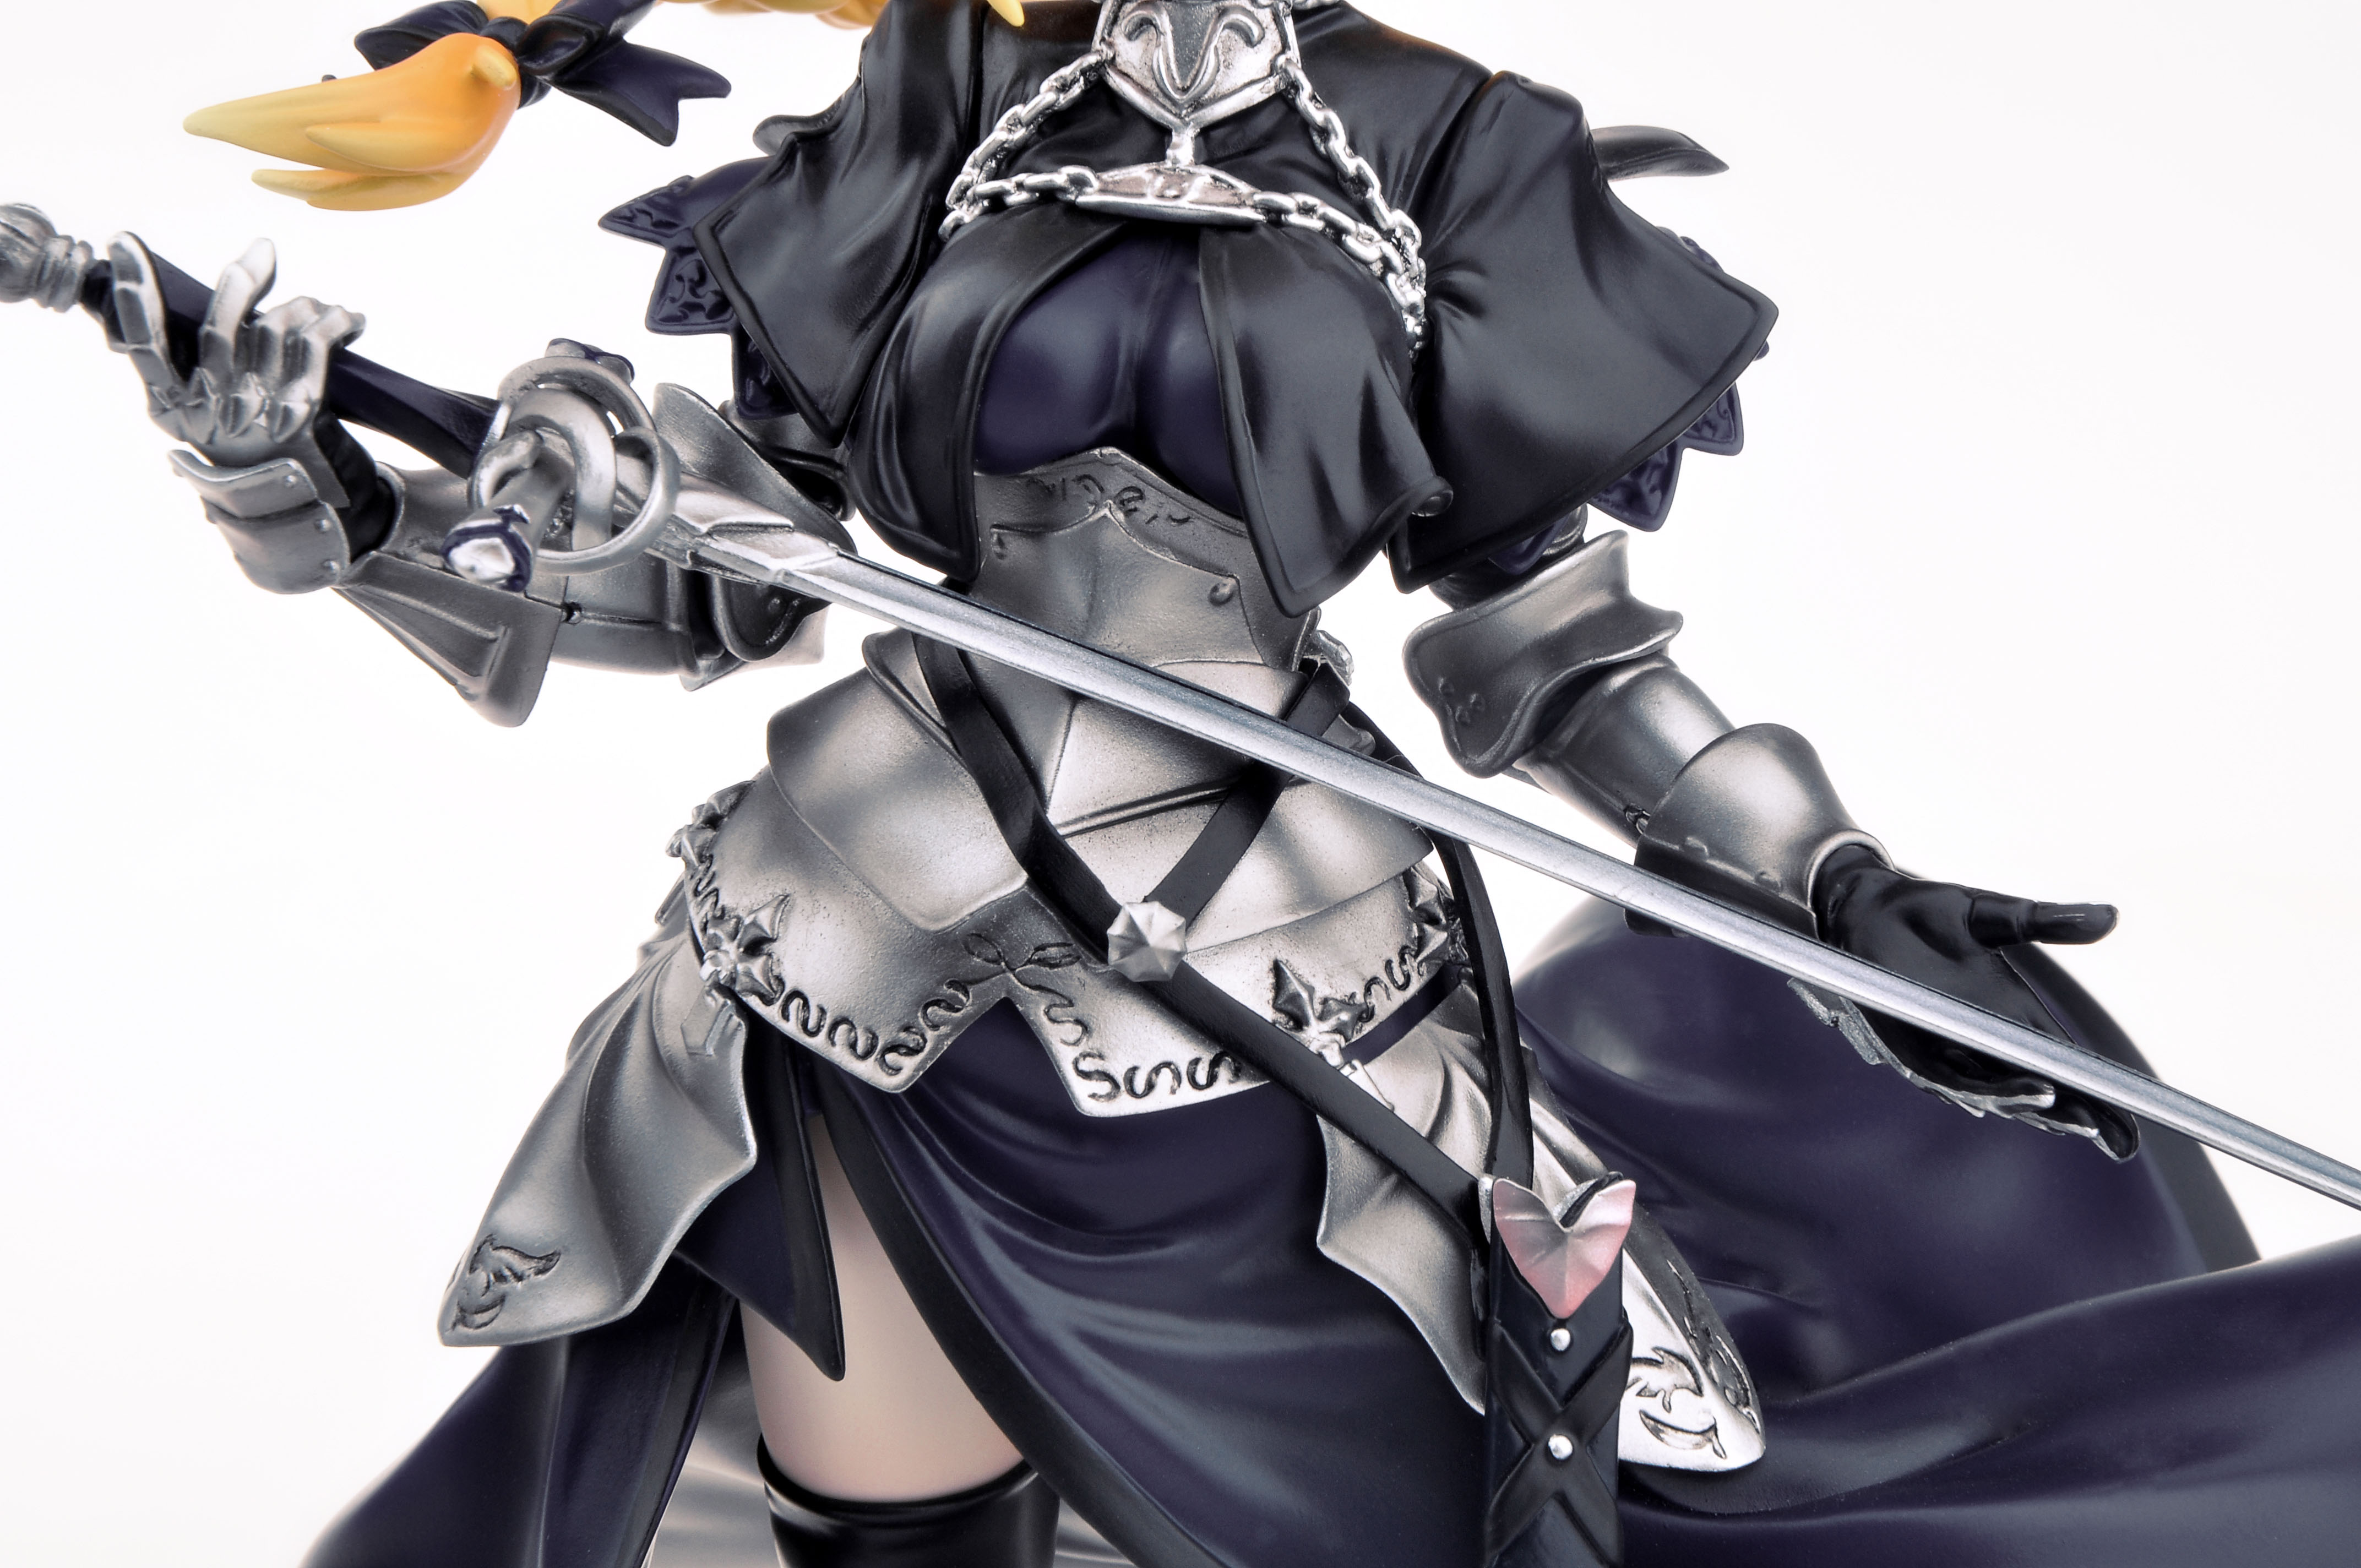 Fate Series Jeanne Ruler prepainted figure haruhichan.com Fate Stay Night anime figure Ruler Joan of Arc 05